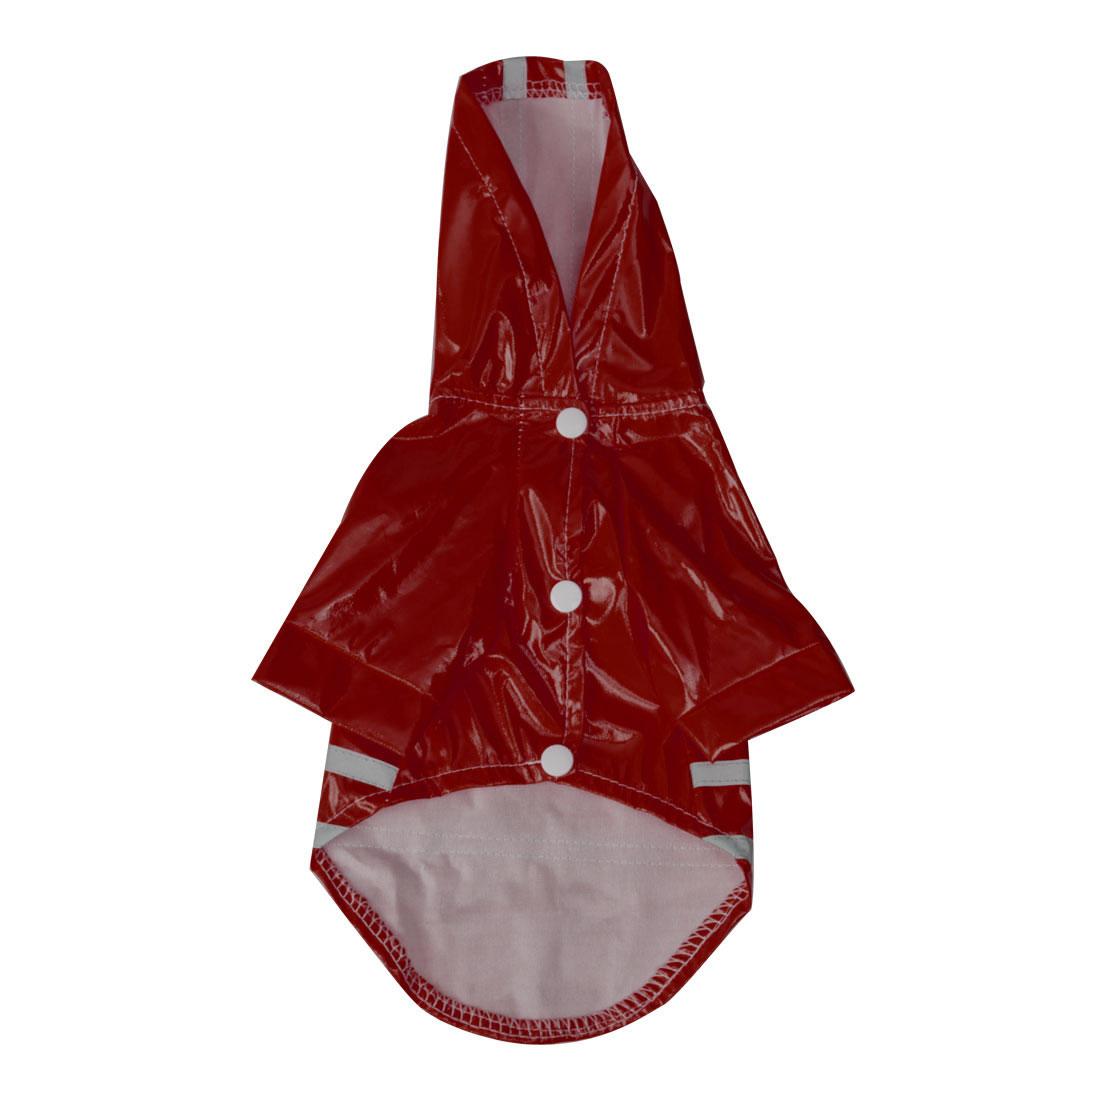 Pet Dog Raincoat Jacket Poncho Coat Polyester Water-resistant Rainwear, Red L